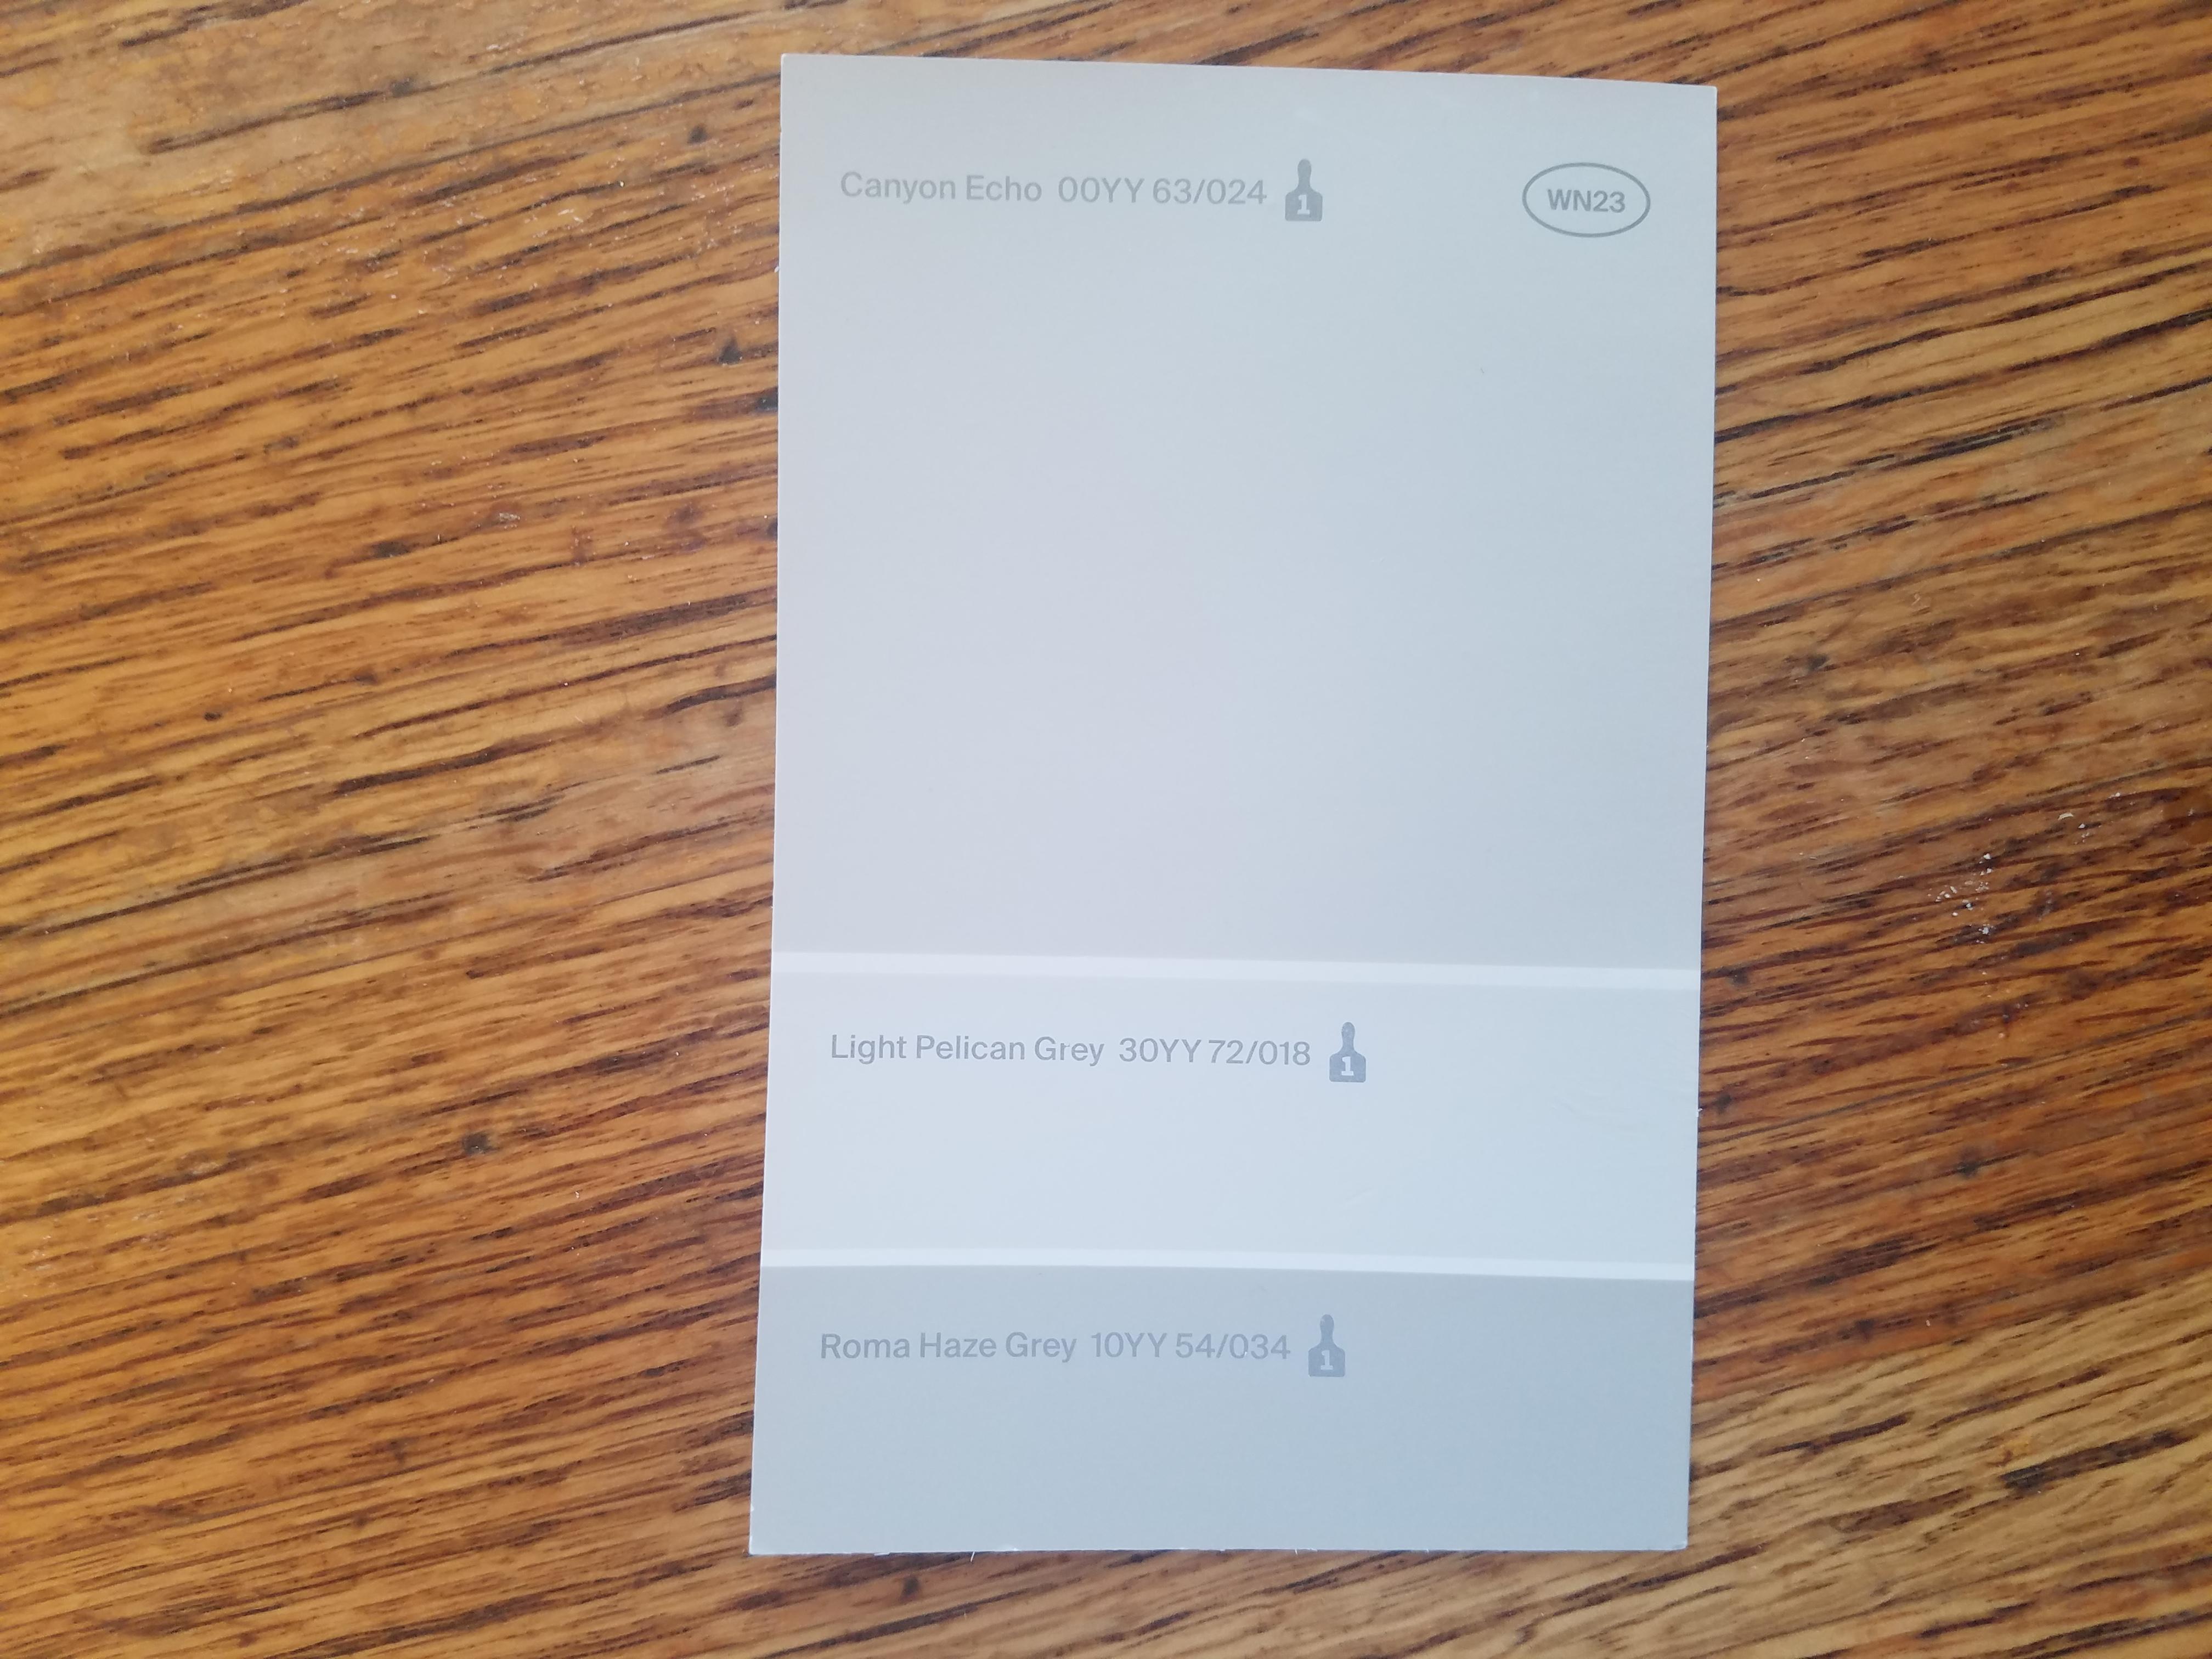 Gray paint swatch